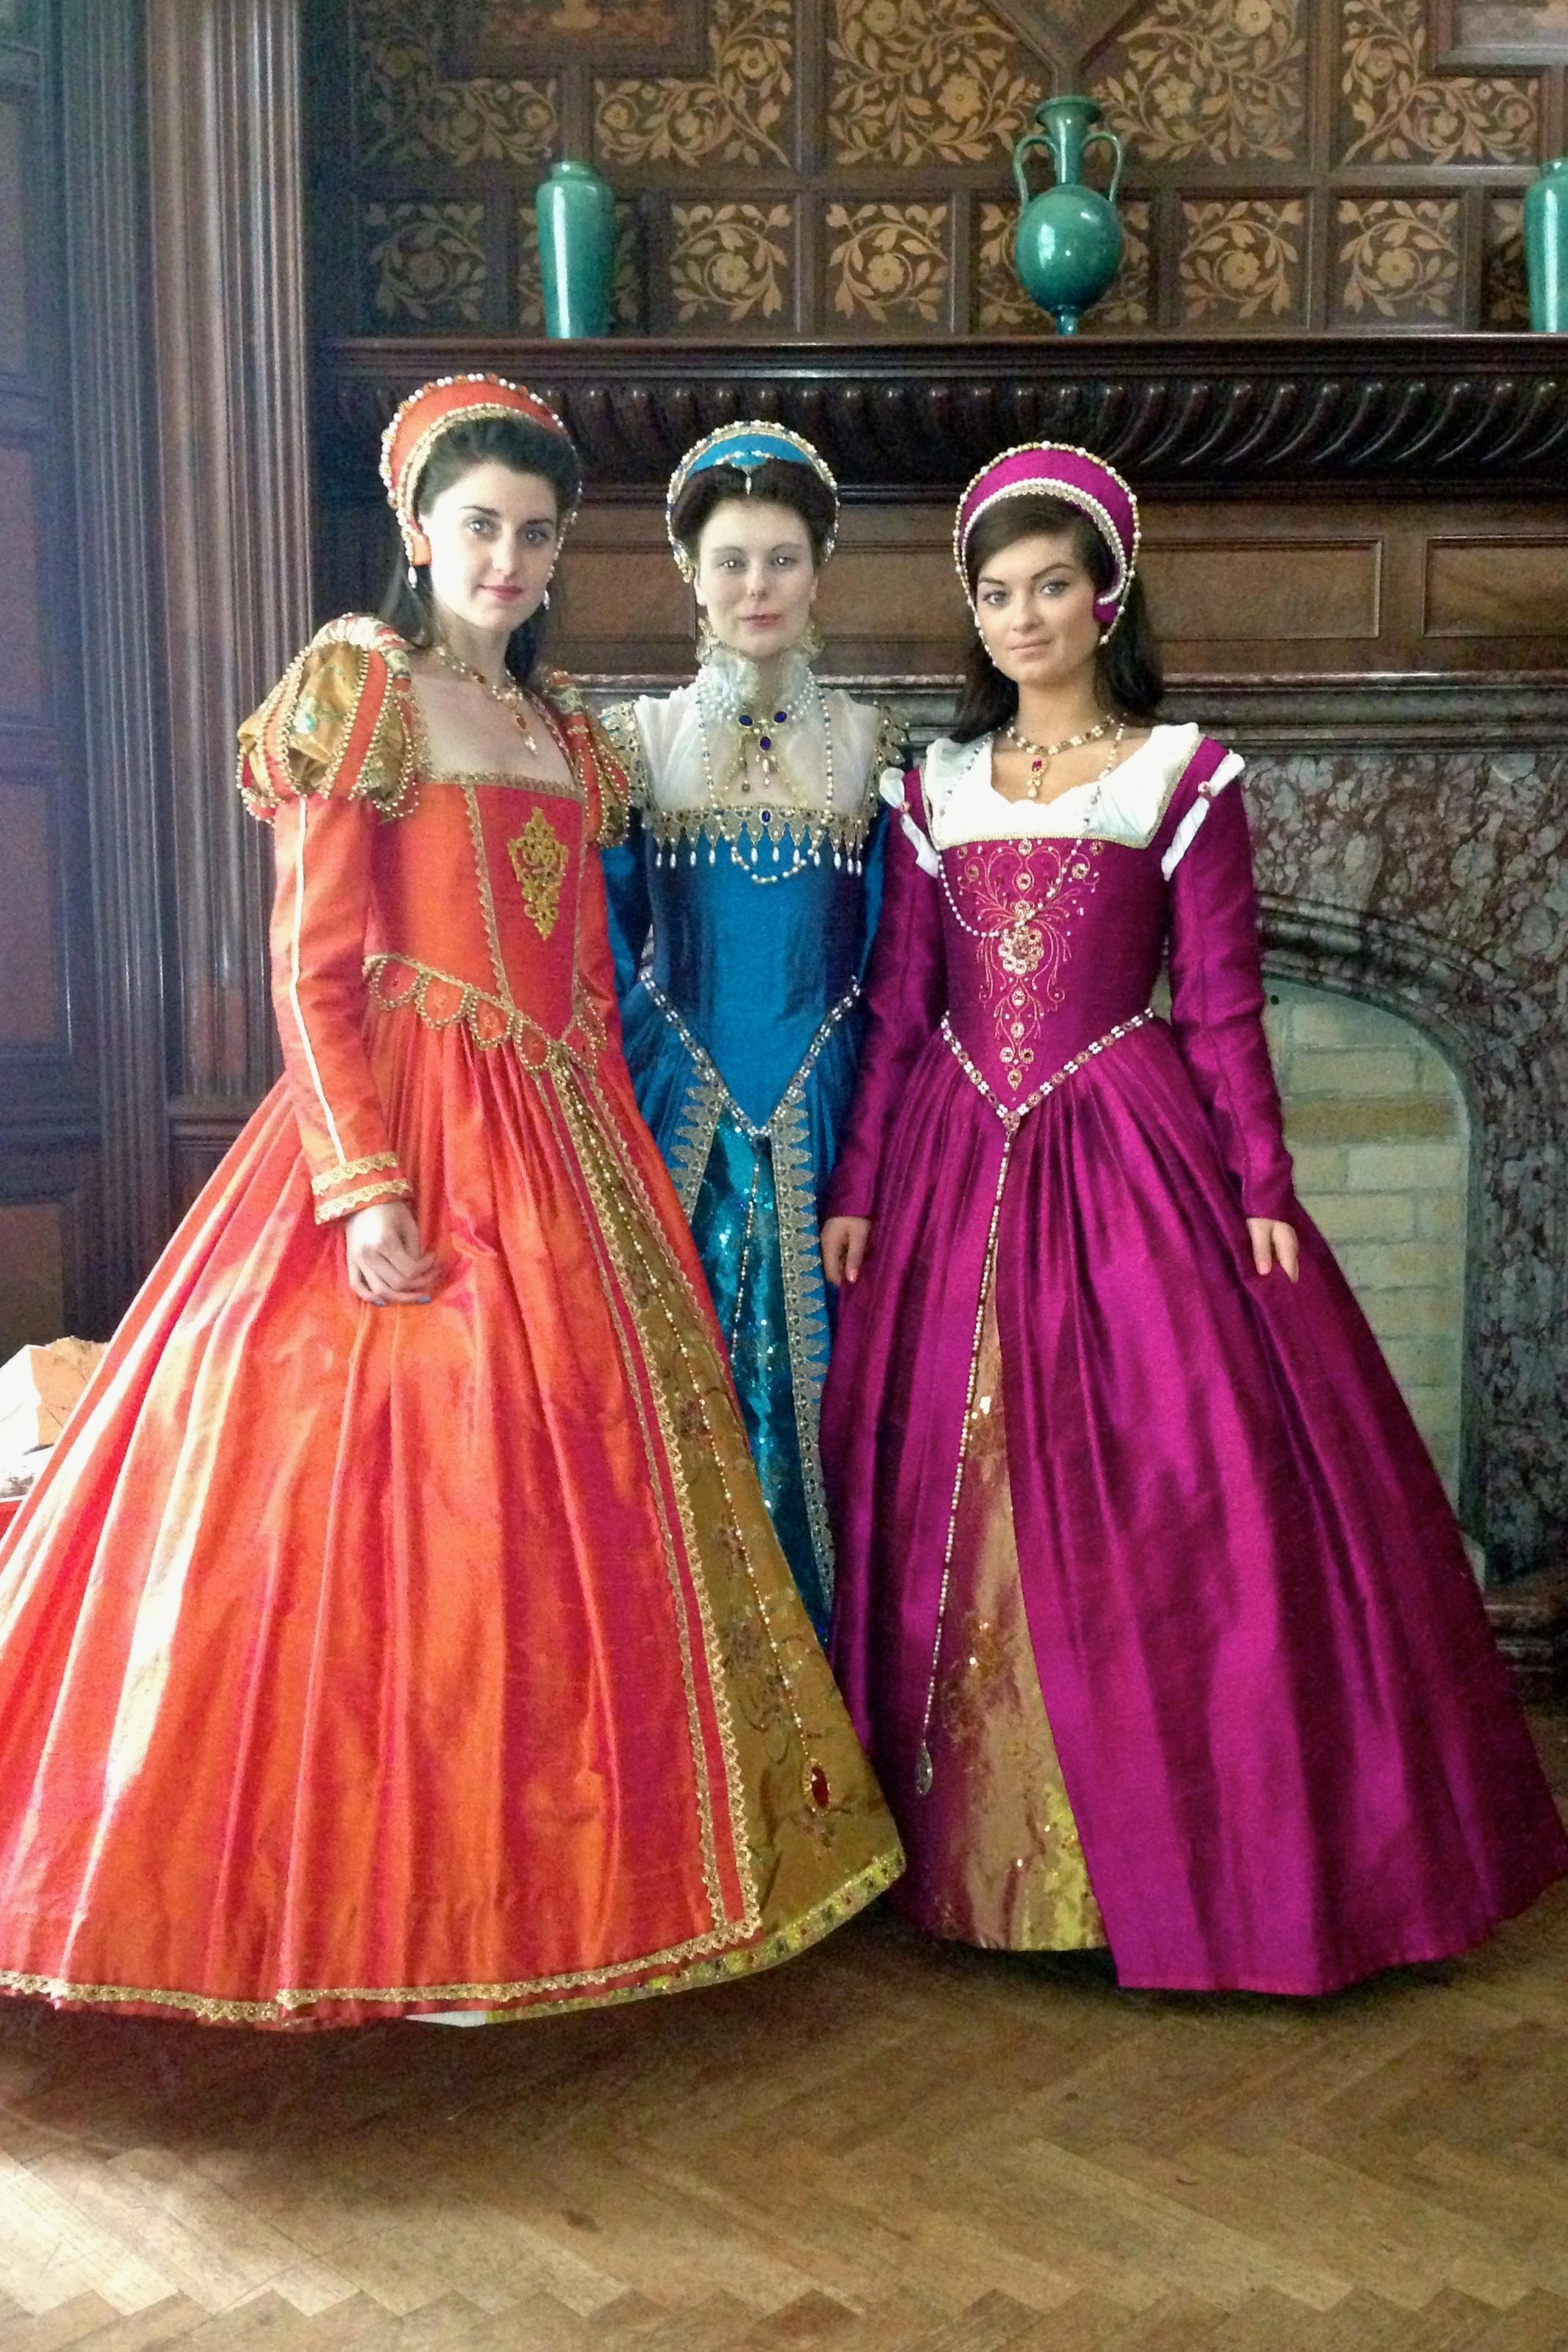 Tudor fashion on tv julia renaissance costumes for Tudor style wedding dress